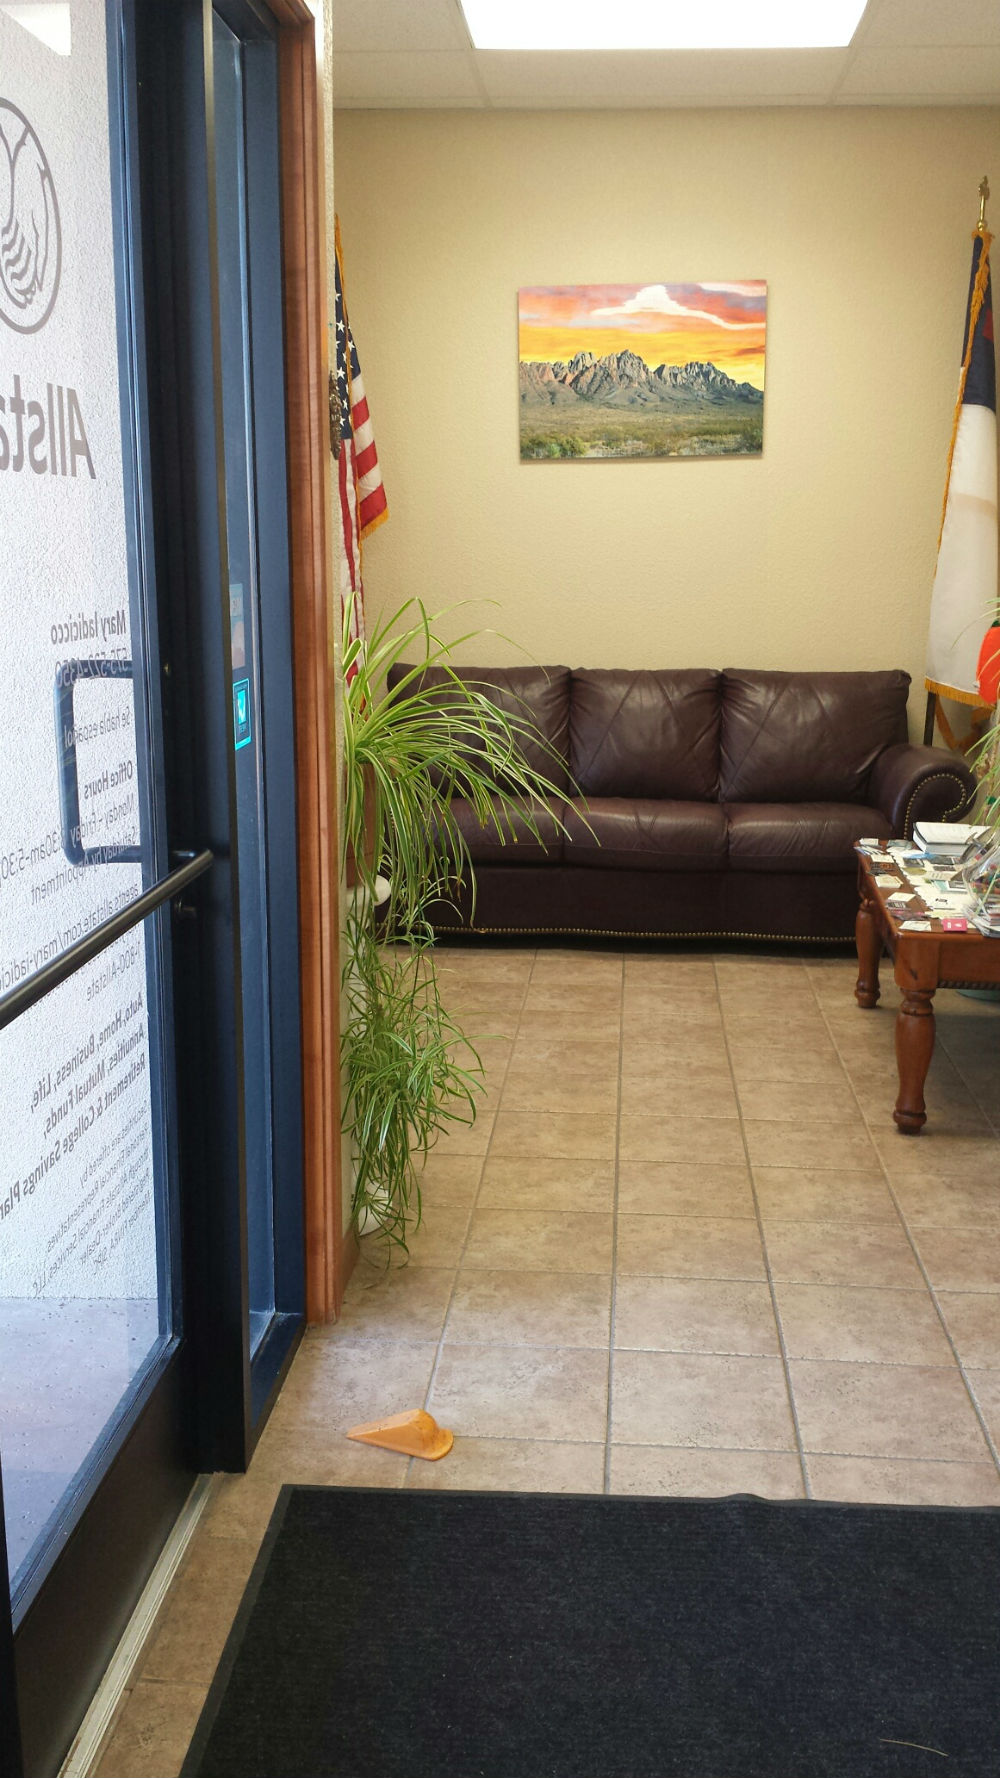 Mary Iadicicco: Allstate Insurance image 1